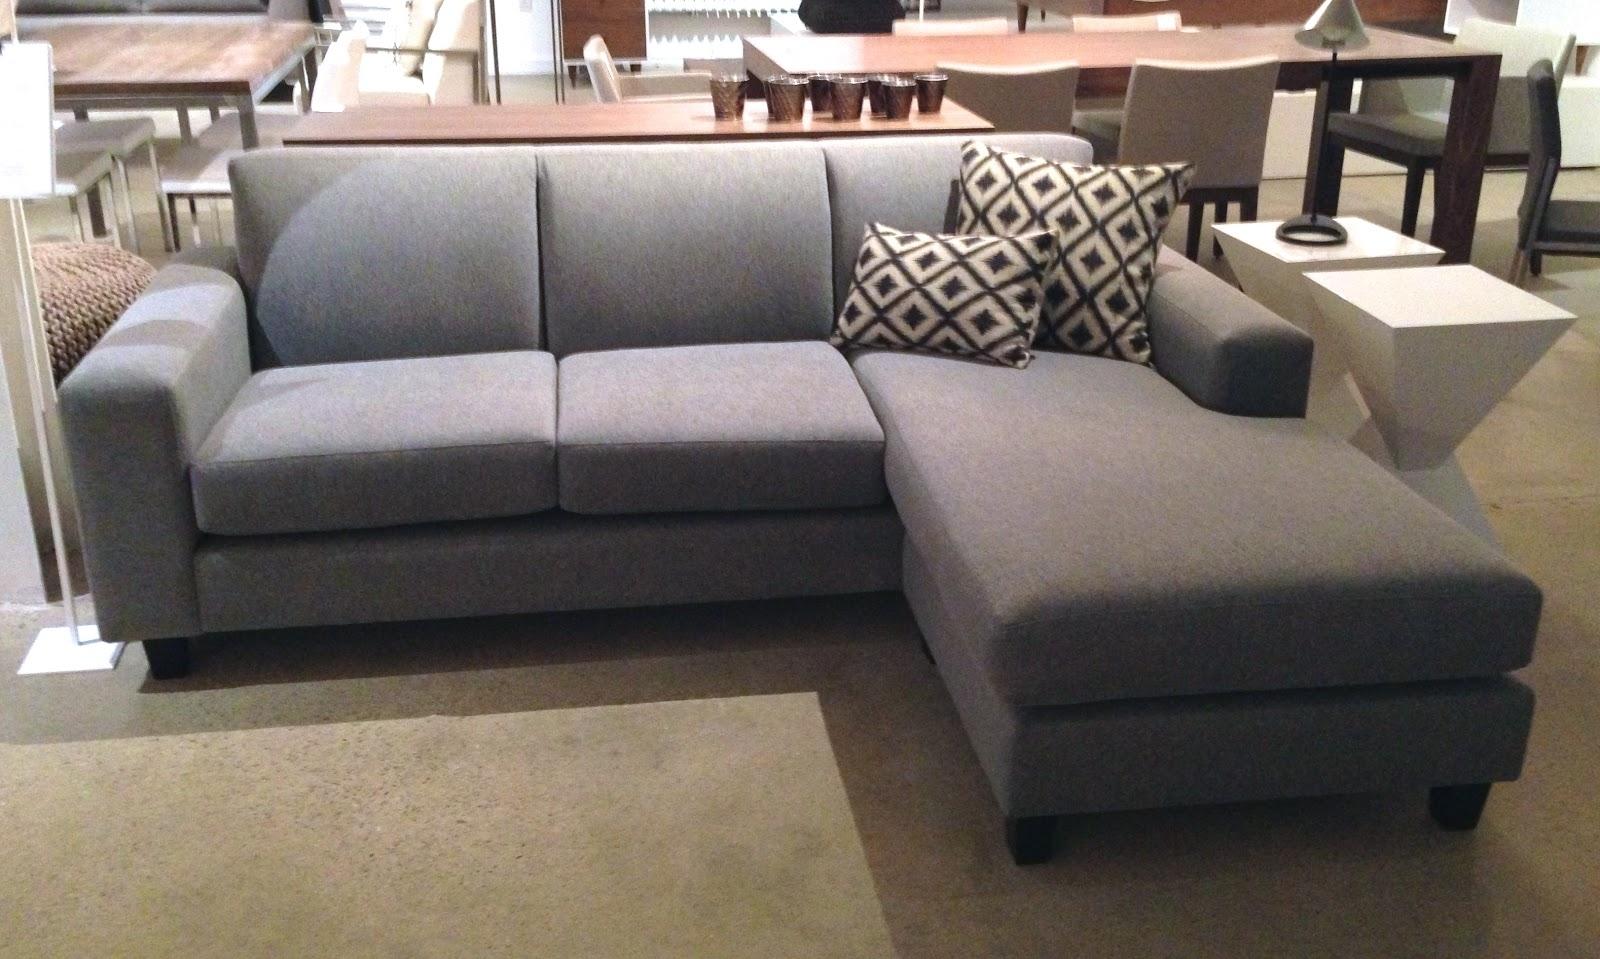 Amazing Condo Sectional Sofa Toronto – Mediasupload Within Sectional Sofas For Condos (Image 2 of 10)